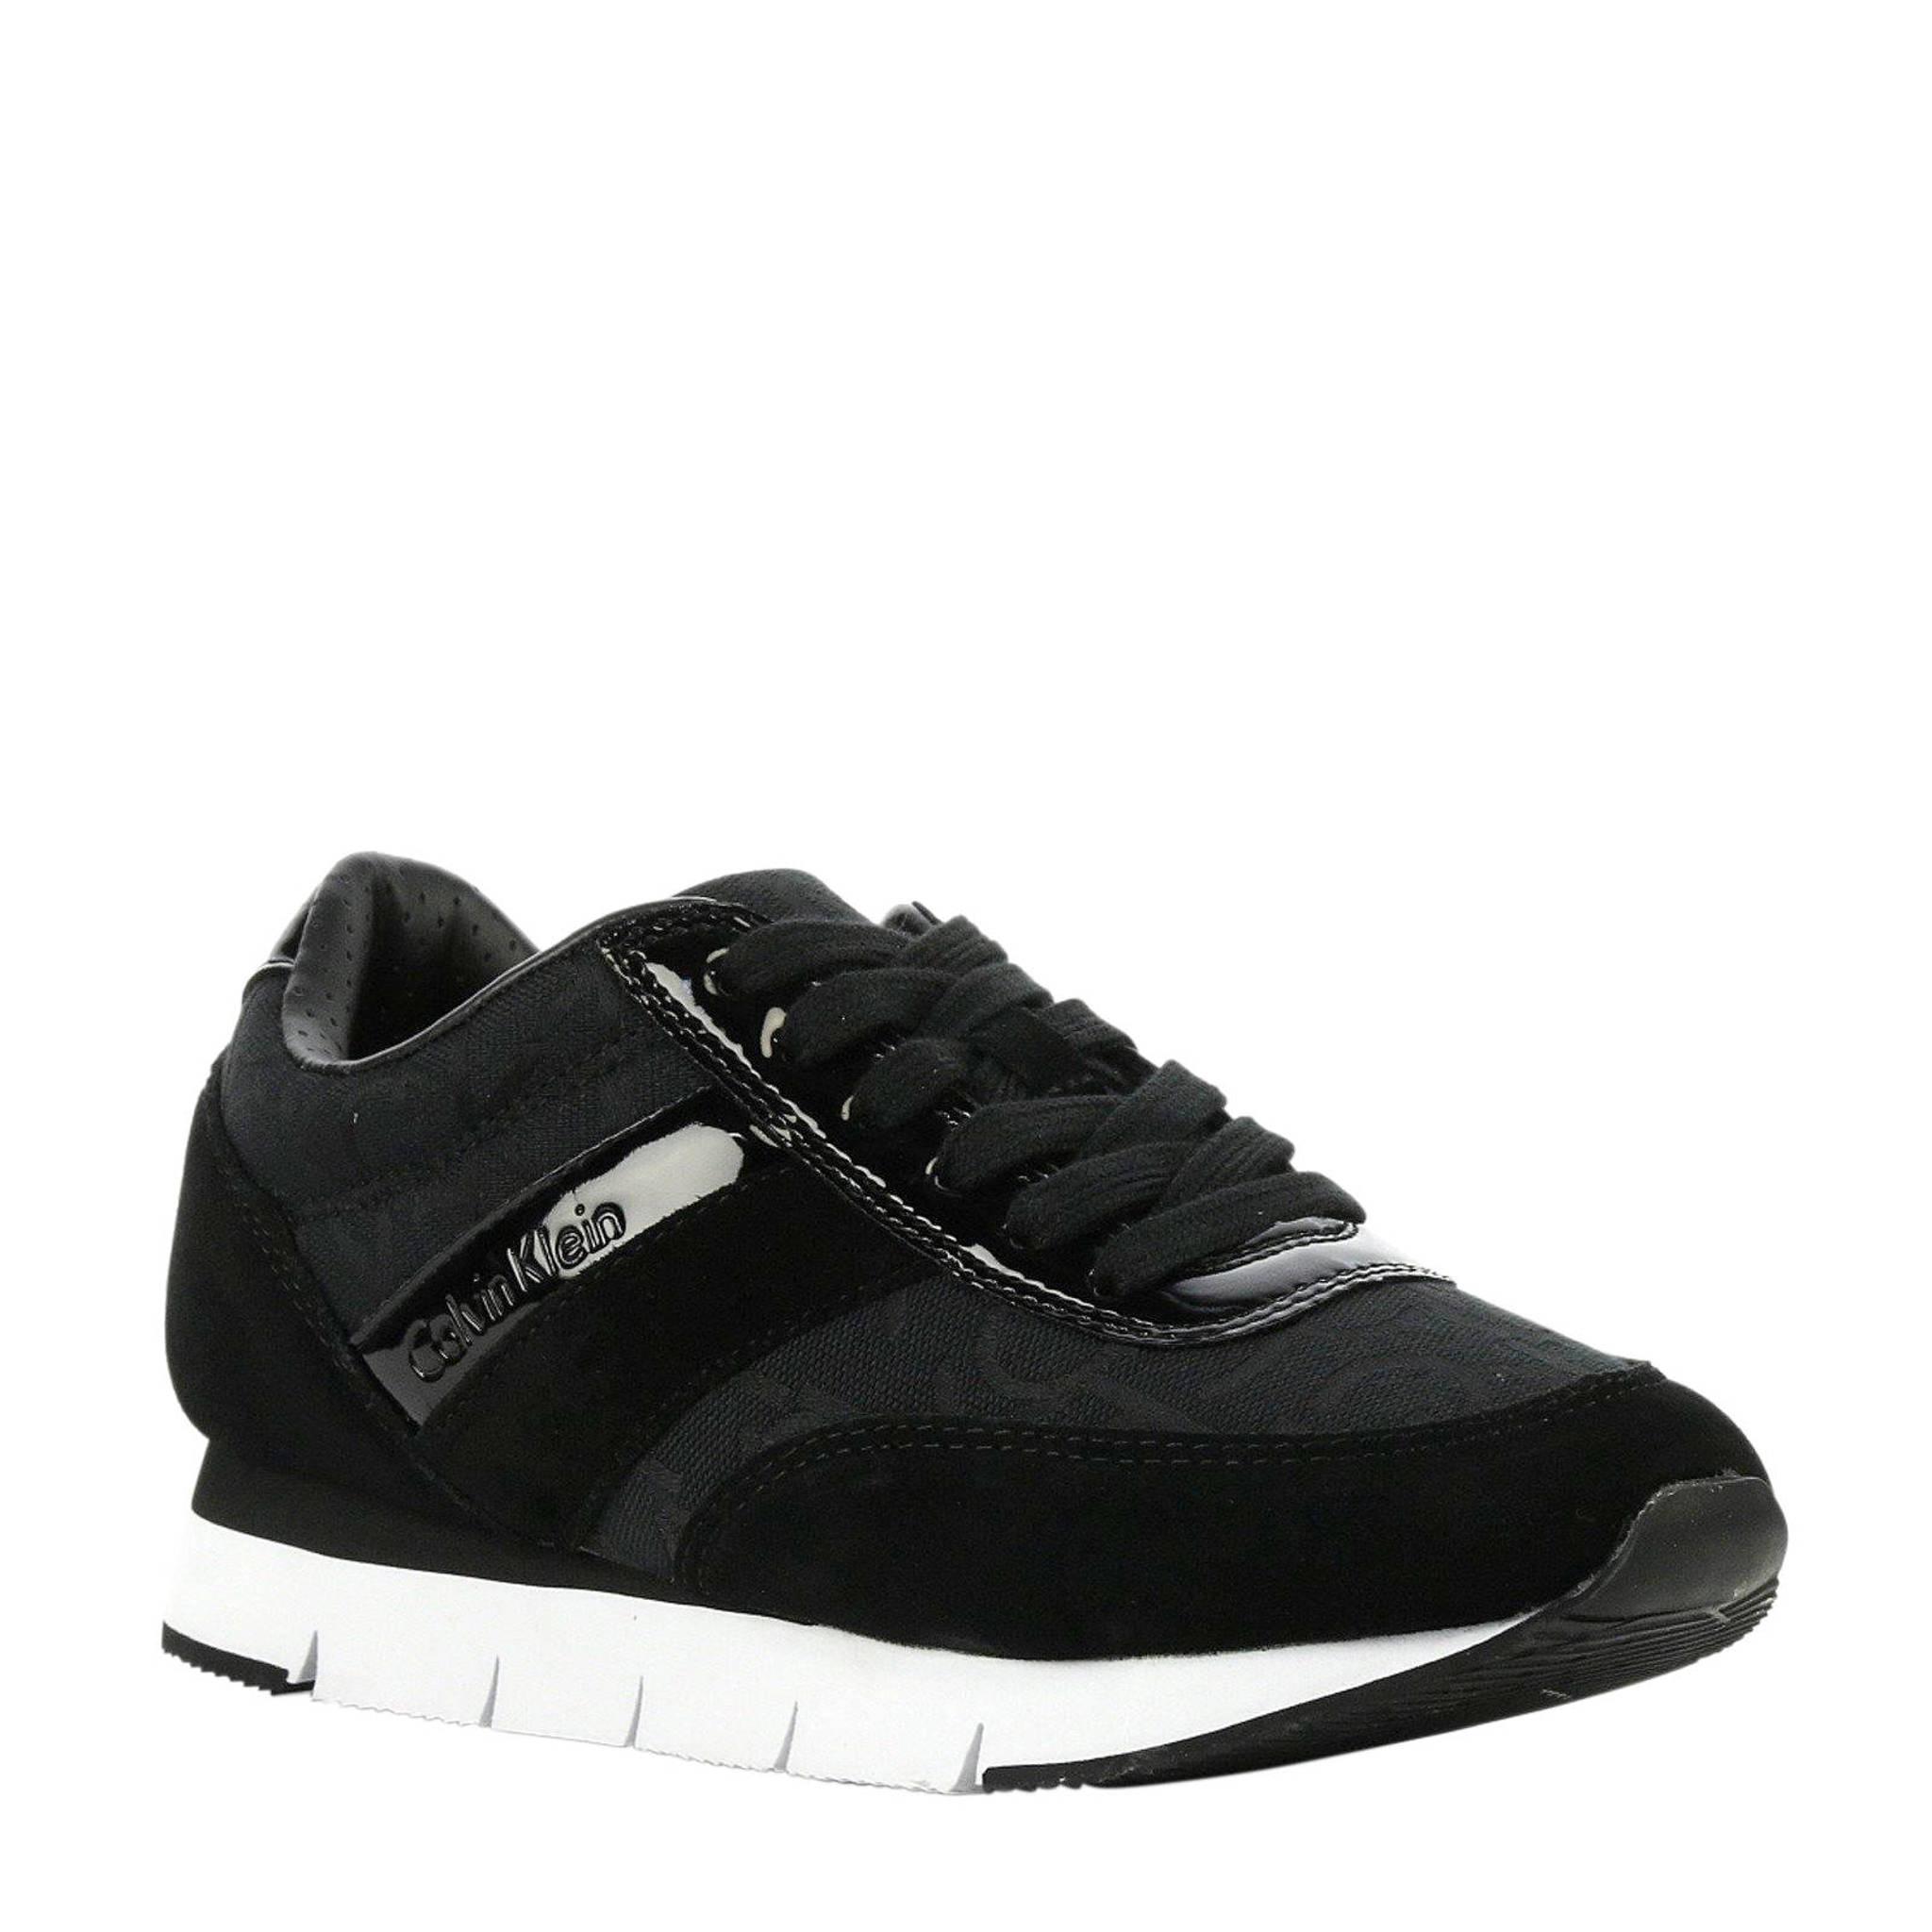 f566989841f Calvin Klein Jeans Tea sneakers zwart | wehkamp